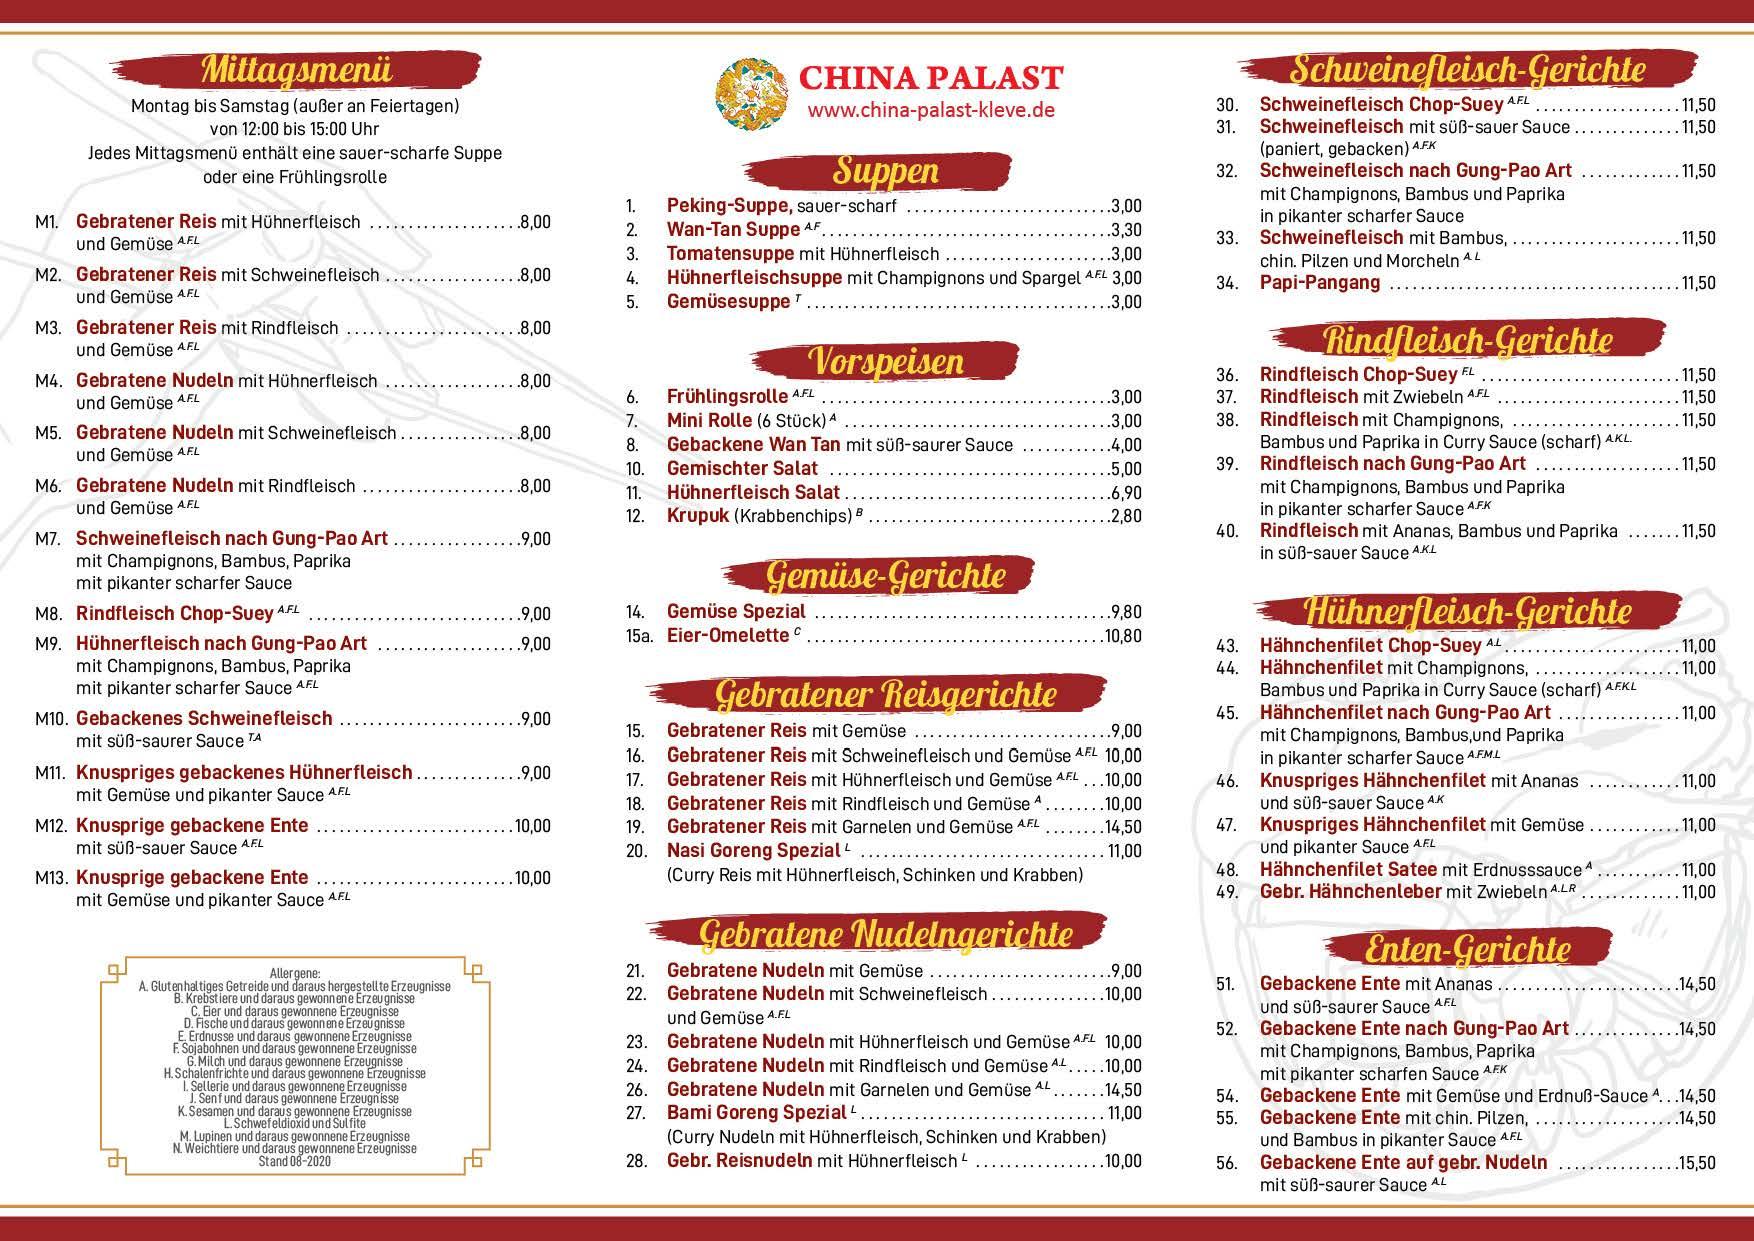 China Palast Kleve - Speisekarte - ab 08-2020 - Rückseite